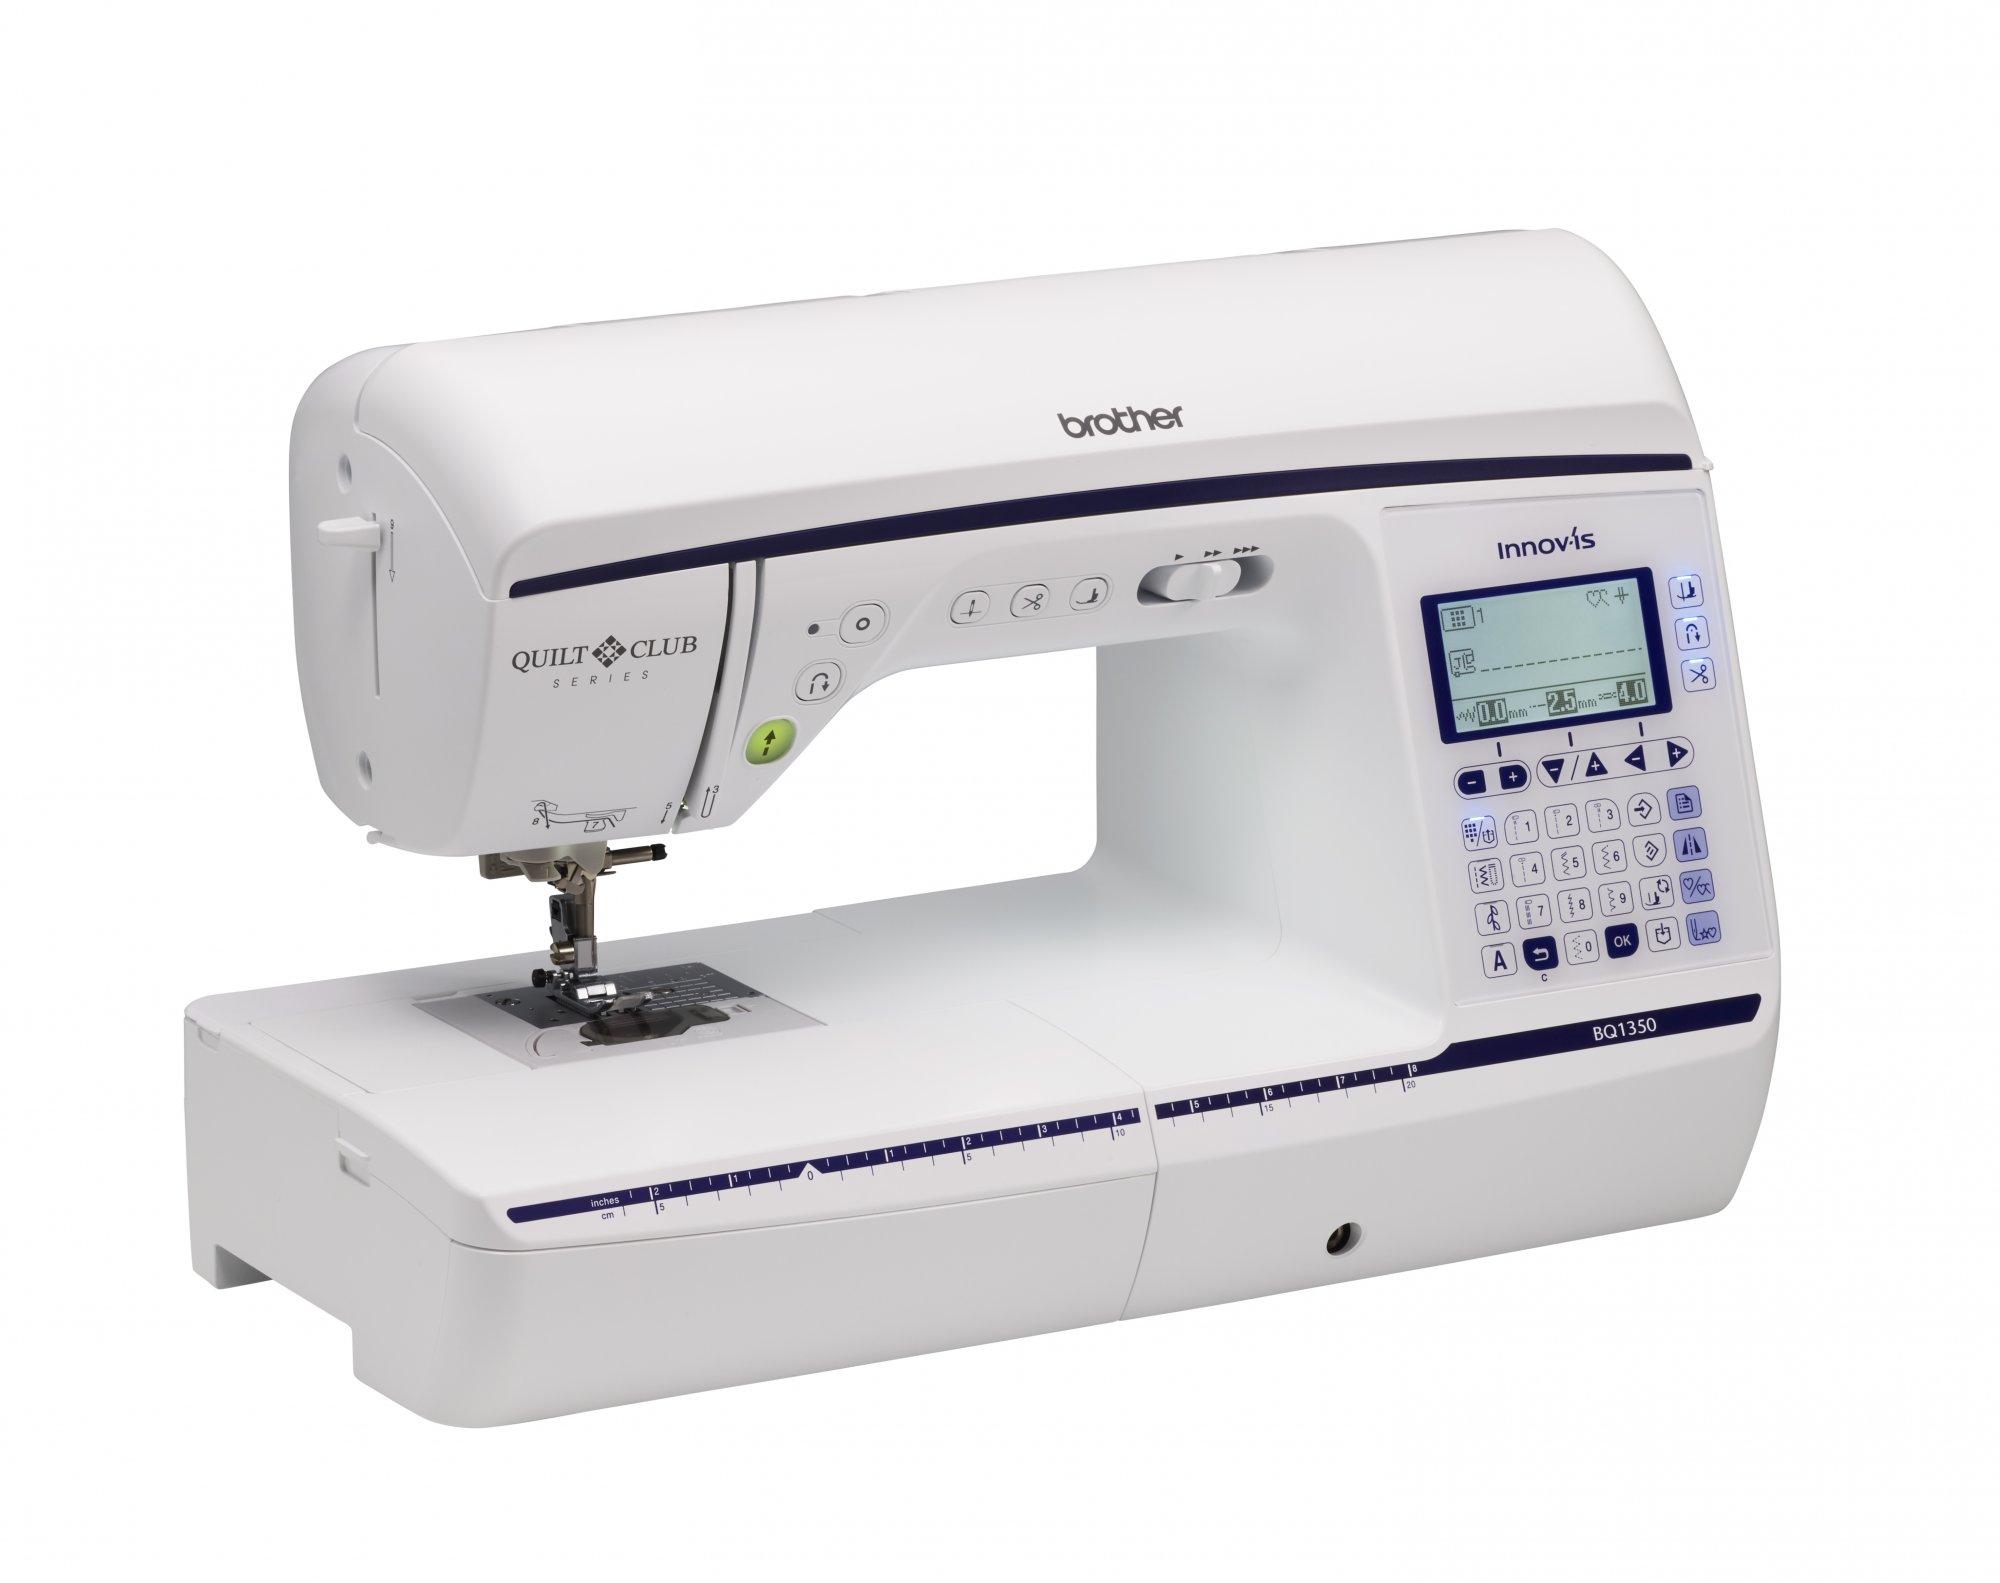 Brother machine BQ1350